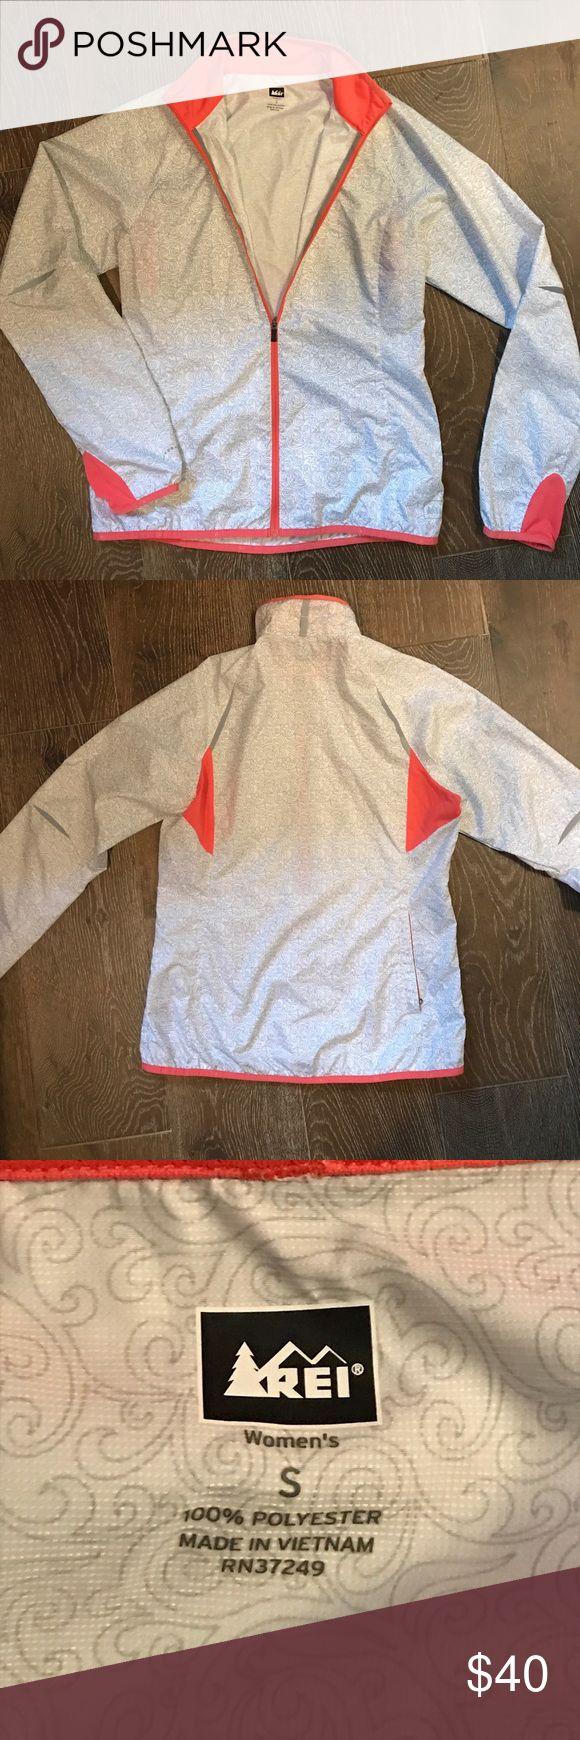 REI lightweight rain jacket size small Lightweight zip up rain jacket. Has reflective details. Zipper pocket for smart phone with a hole to thread the headphones through REI Jackets & Coats